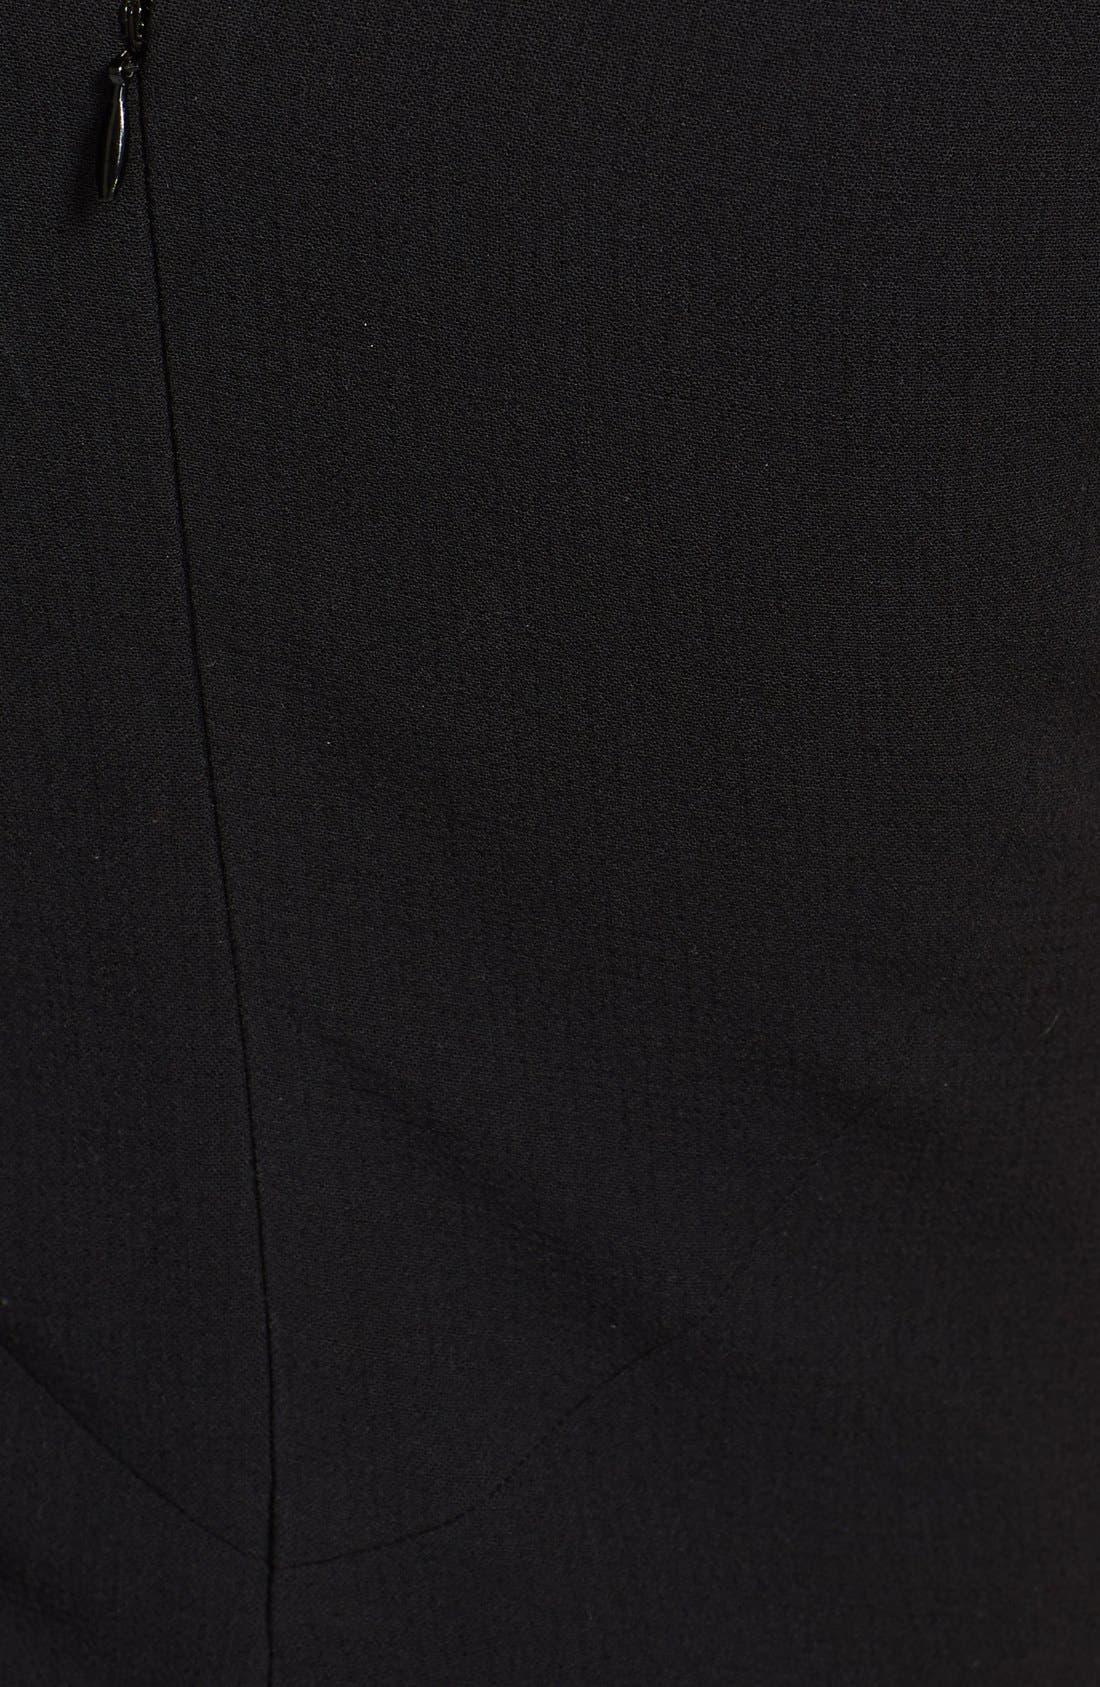 Alternate Image 3  - Emilio Pucci Ruffled Sleeve Stretch Wool Dress